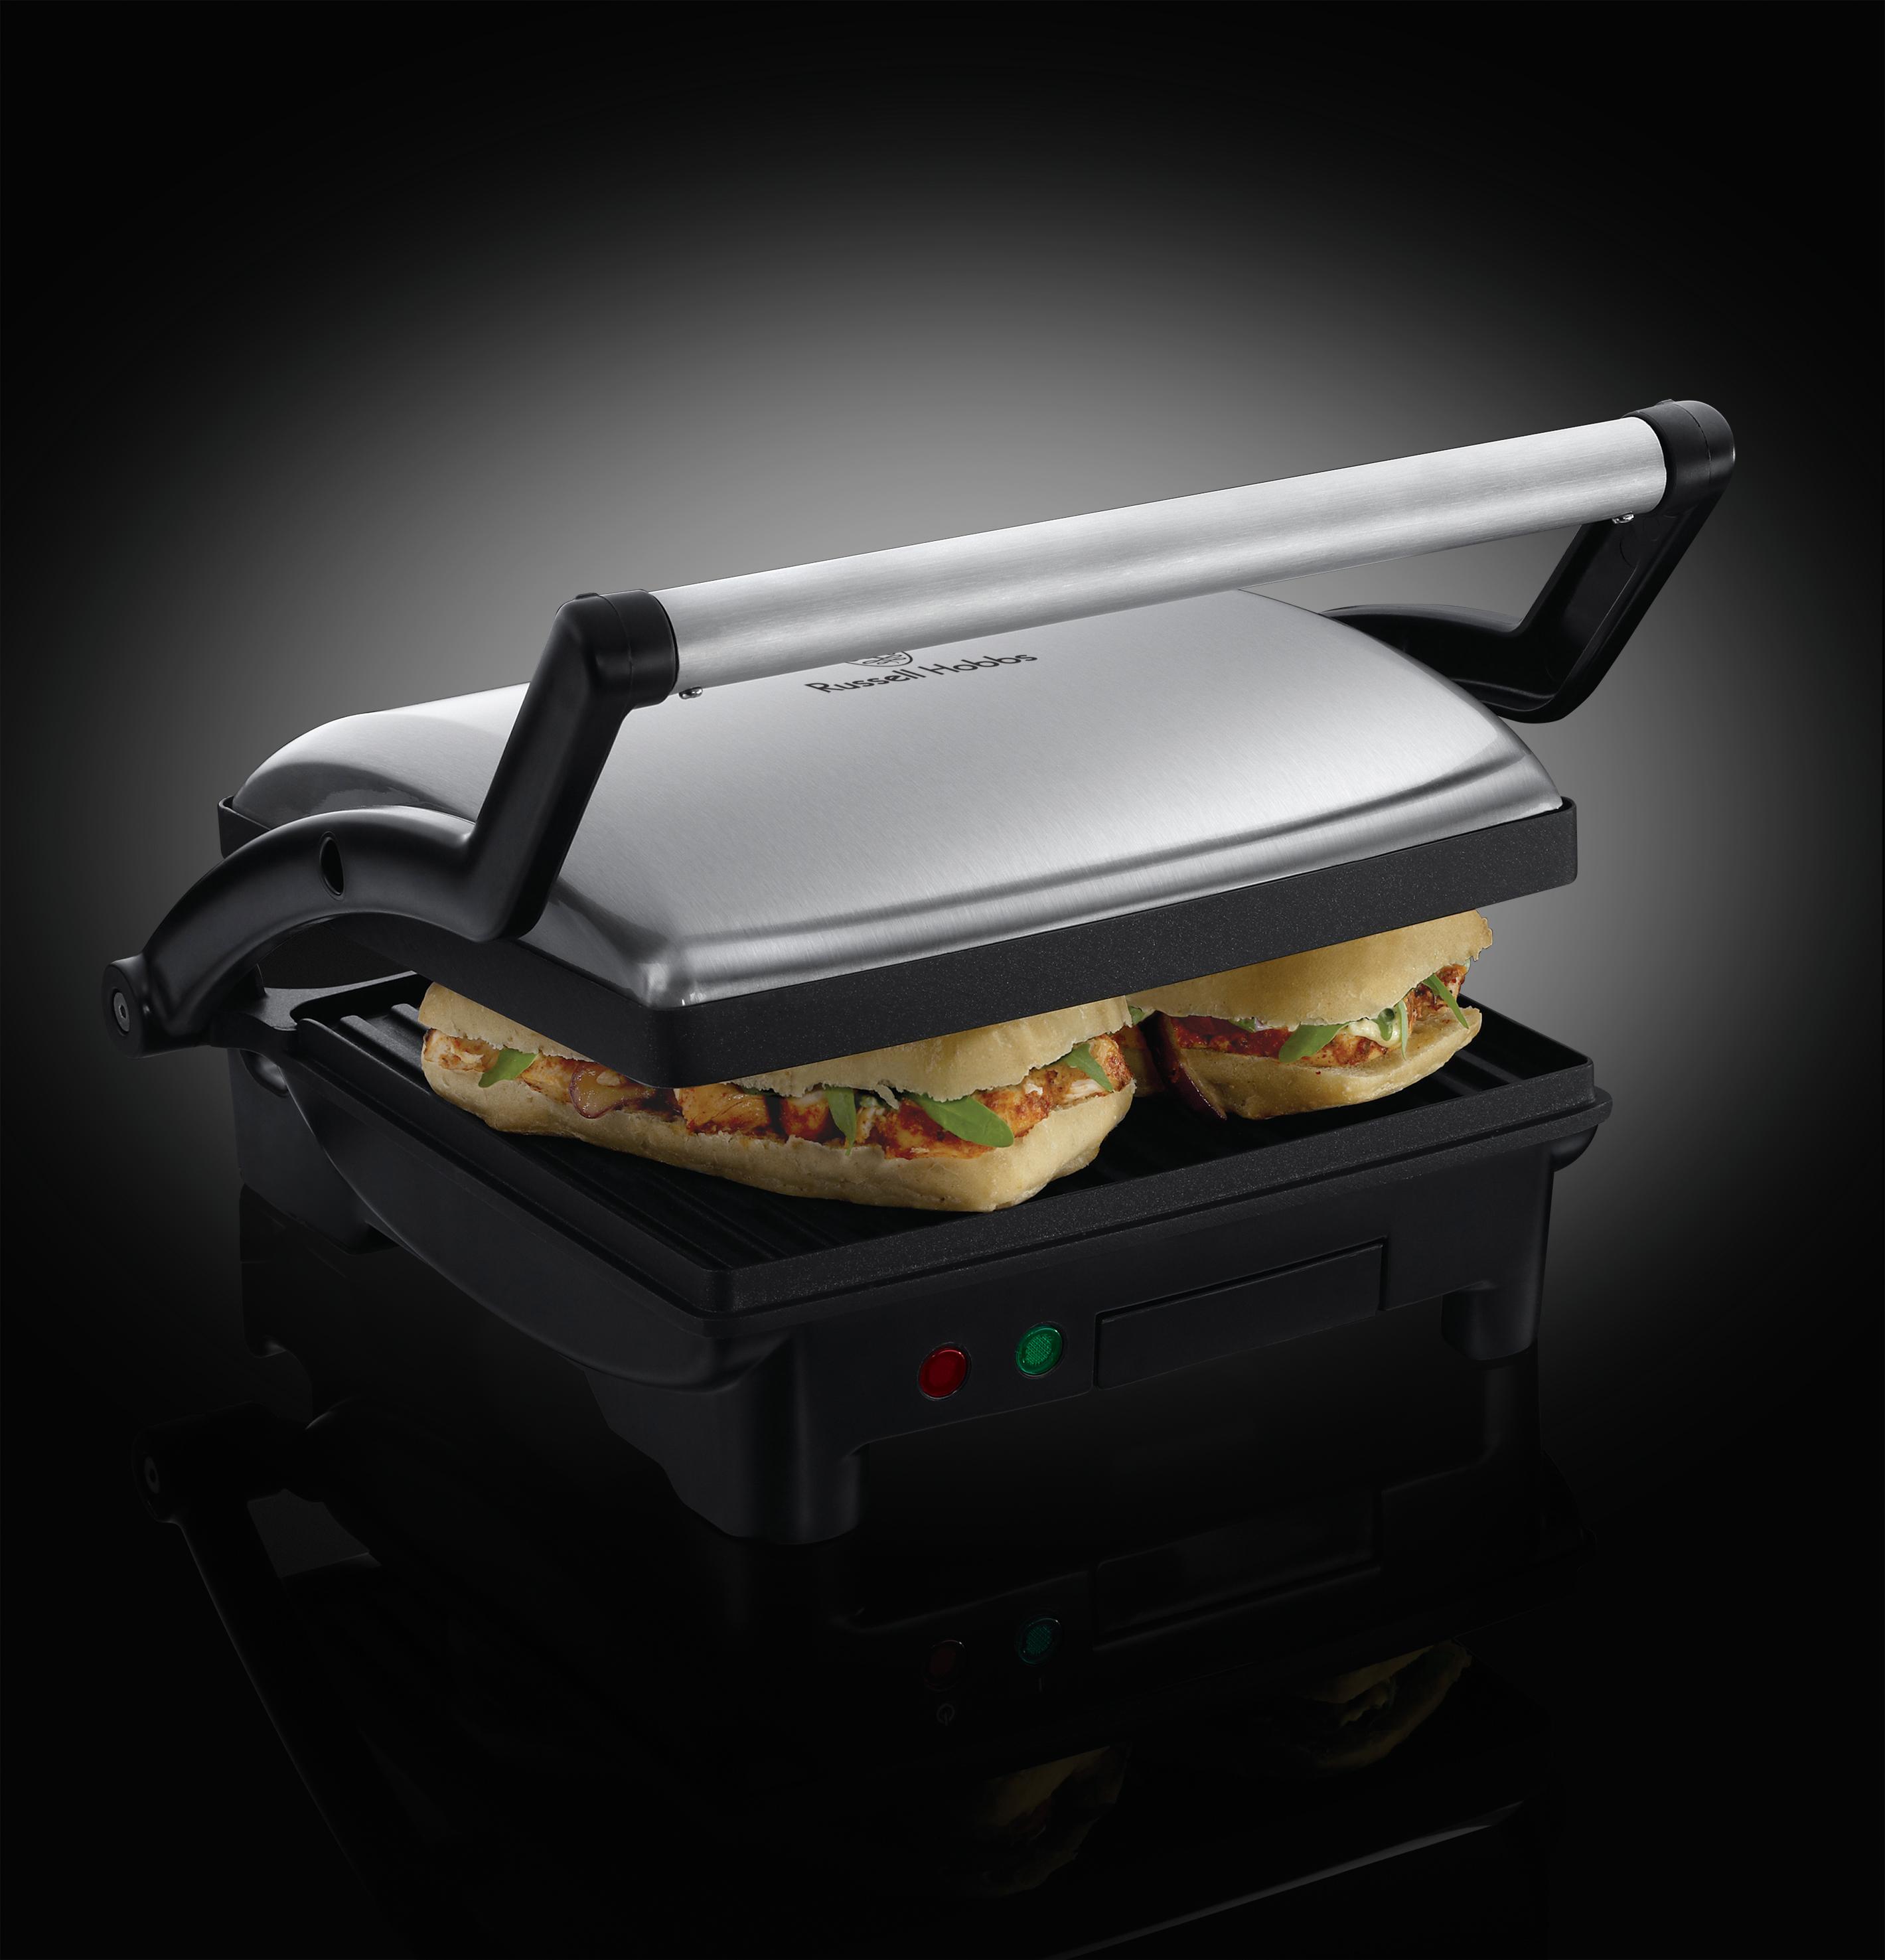 russell hobbs panini grill 17888 56 j lensen huishoud b v. Black Bedroom Furniture Sets. Home Design Ideas